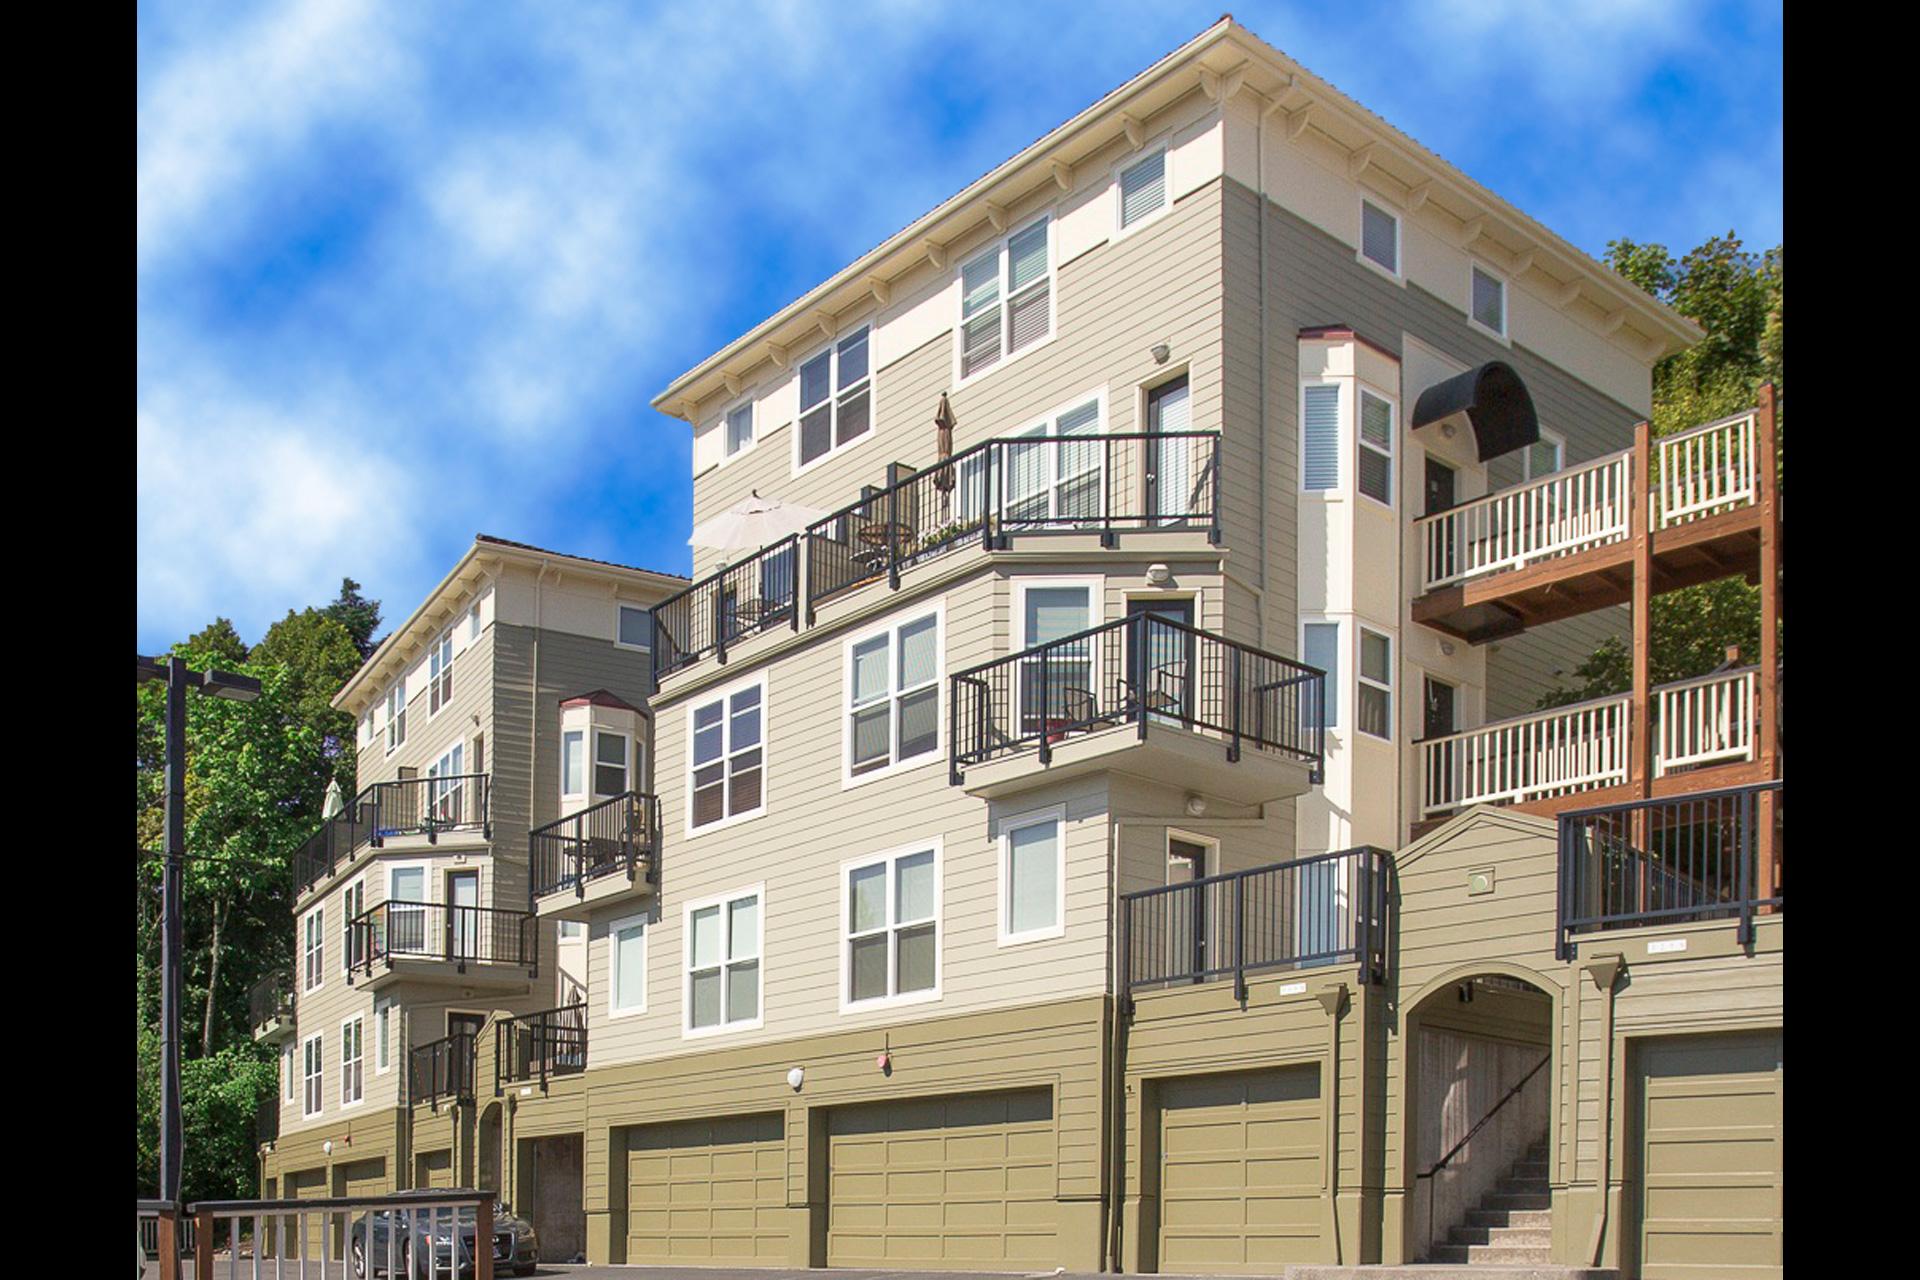 hilltop-condominiums-uptown-image-1